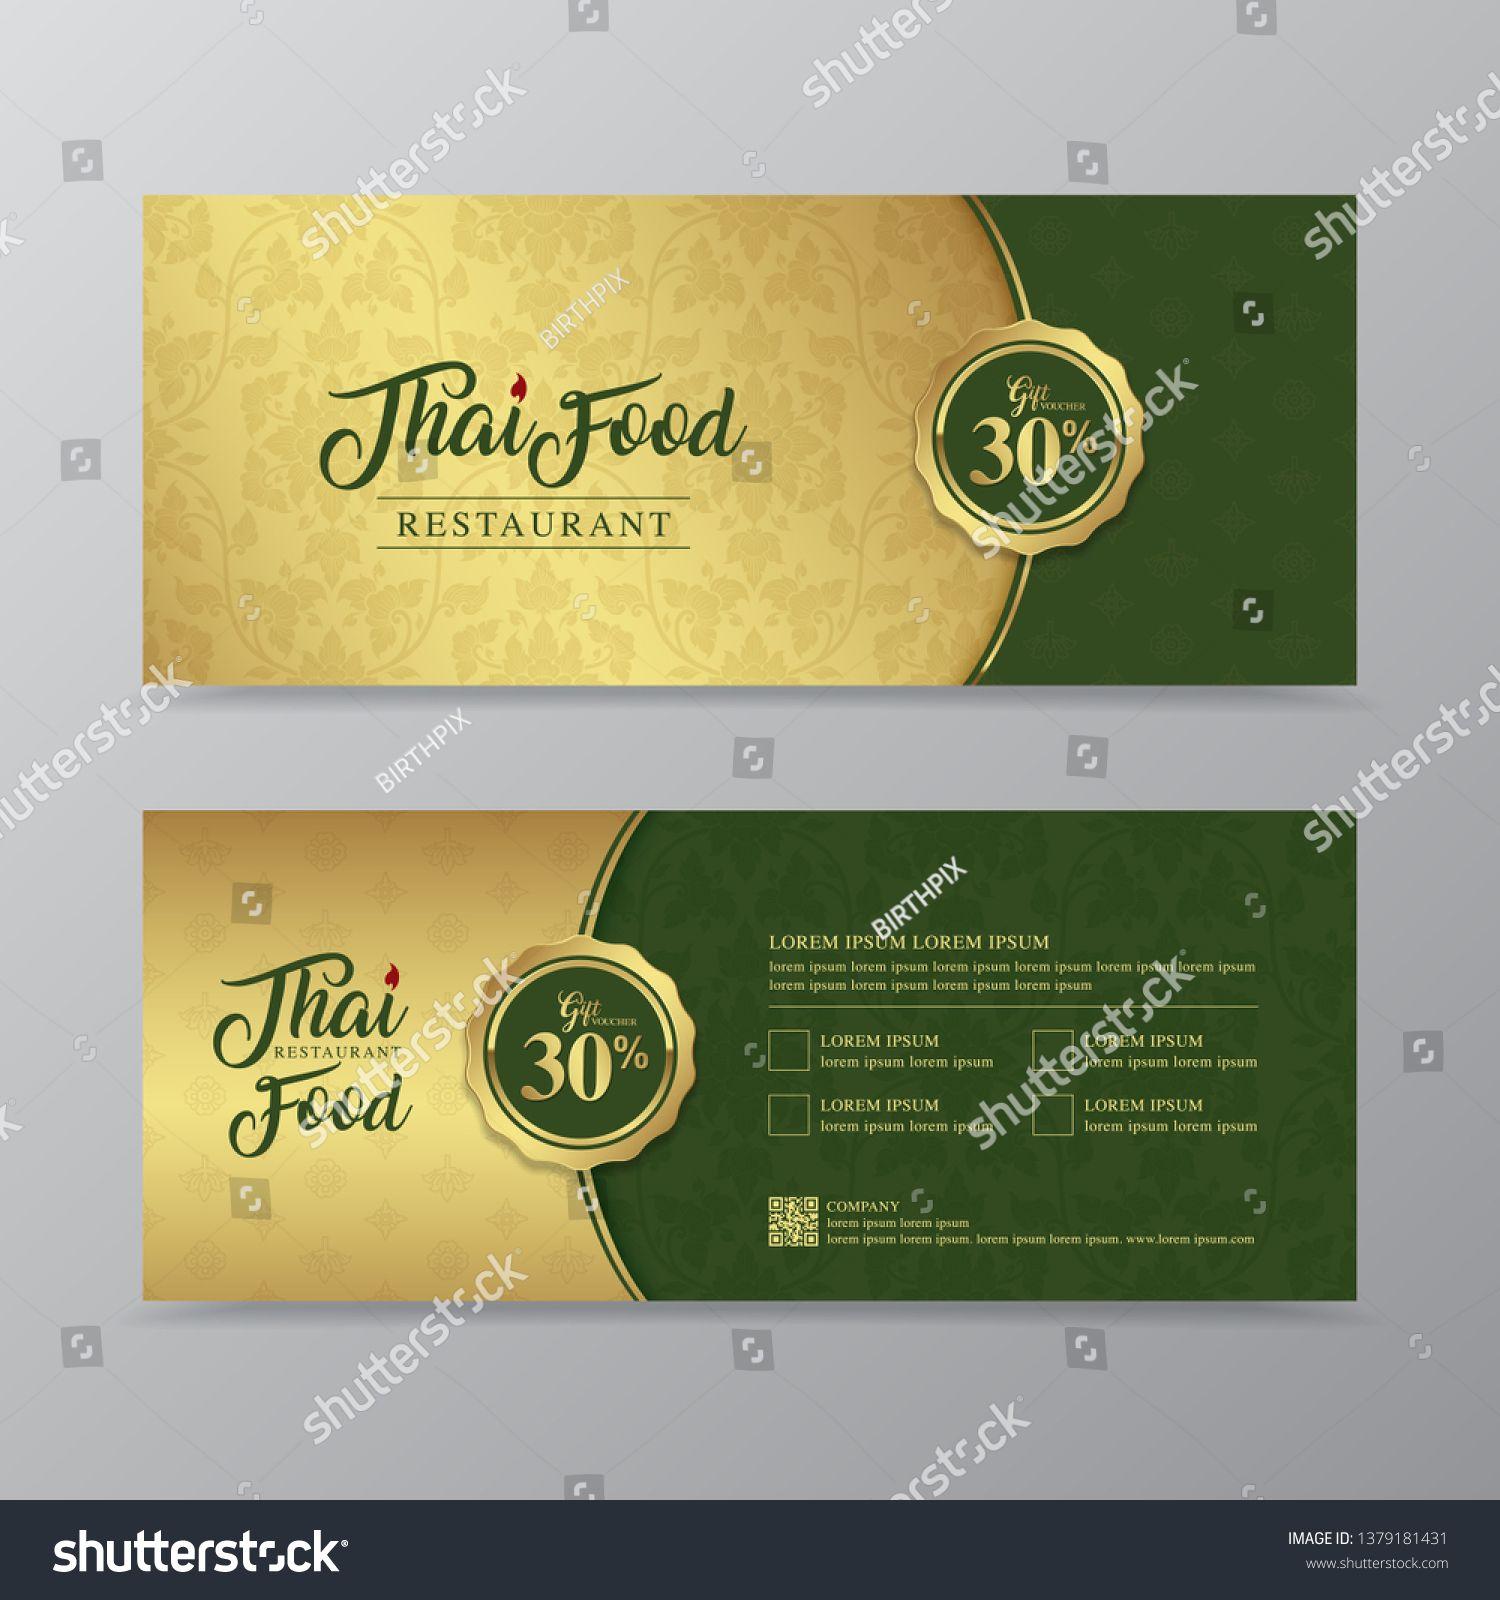 Thai Food And Thai Restaurant Luxury Gift Voucher Design Template For Printing Flyers Poster Web Bann Gift Voucher Design Thai Recipes Thai Food Restaurant